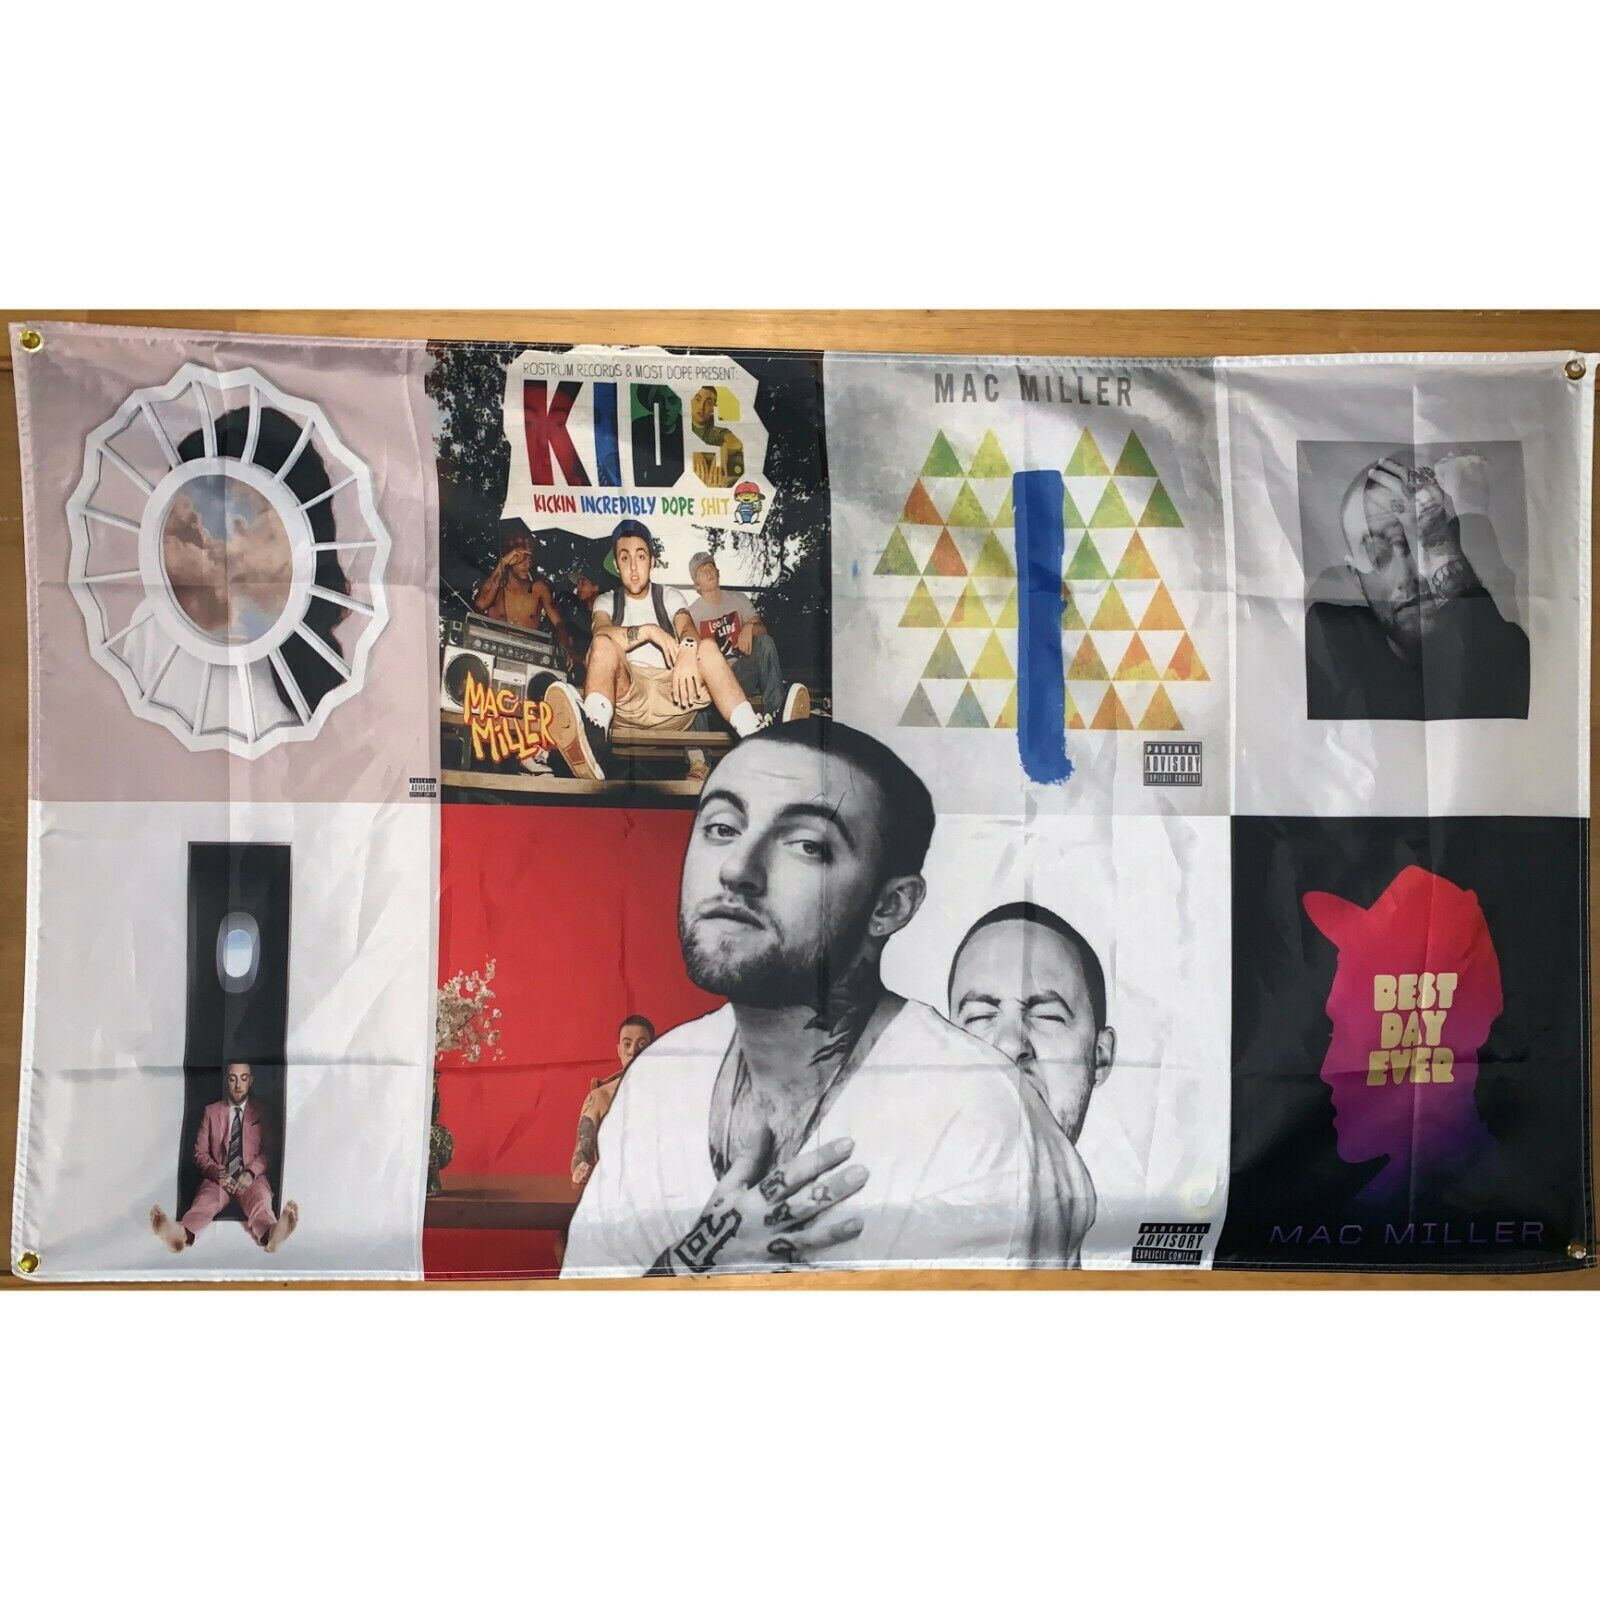 Mac Miller Album Cover Collage Art Music Poster Hanging Tape